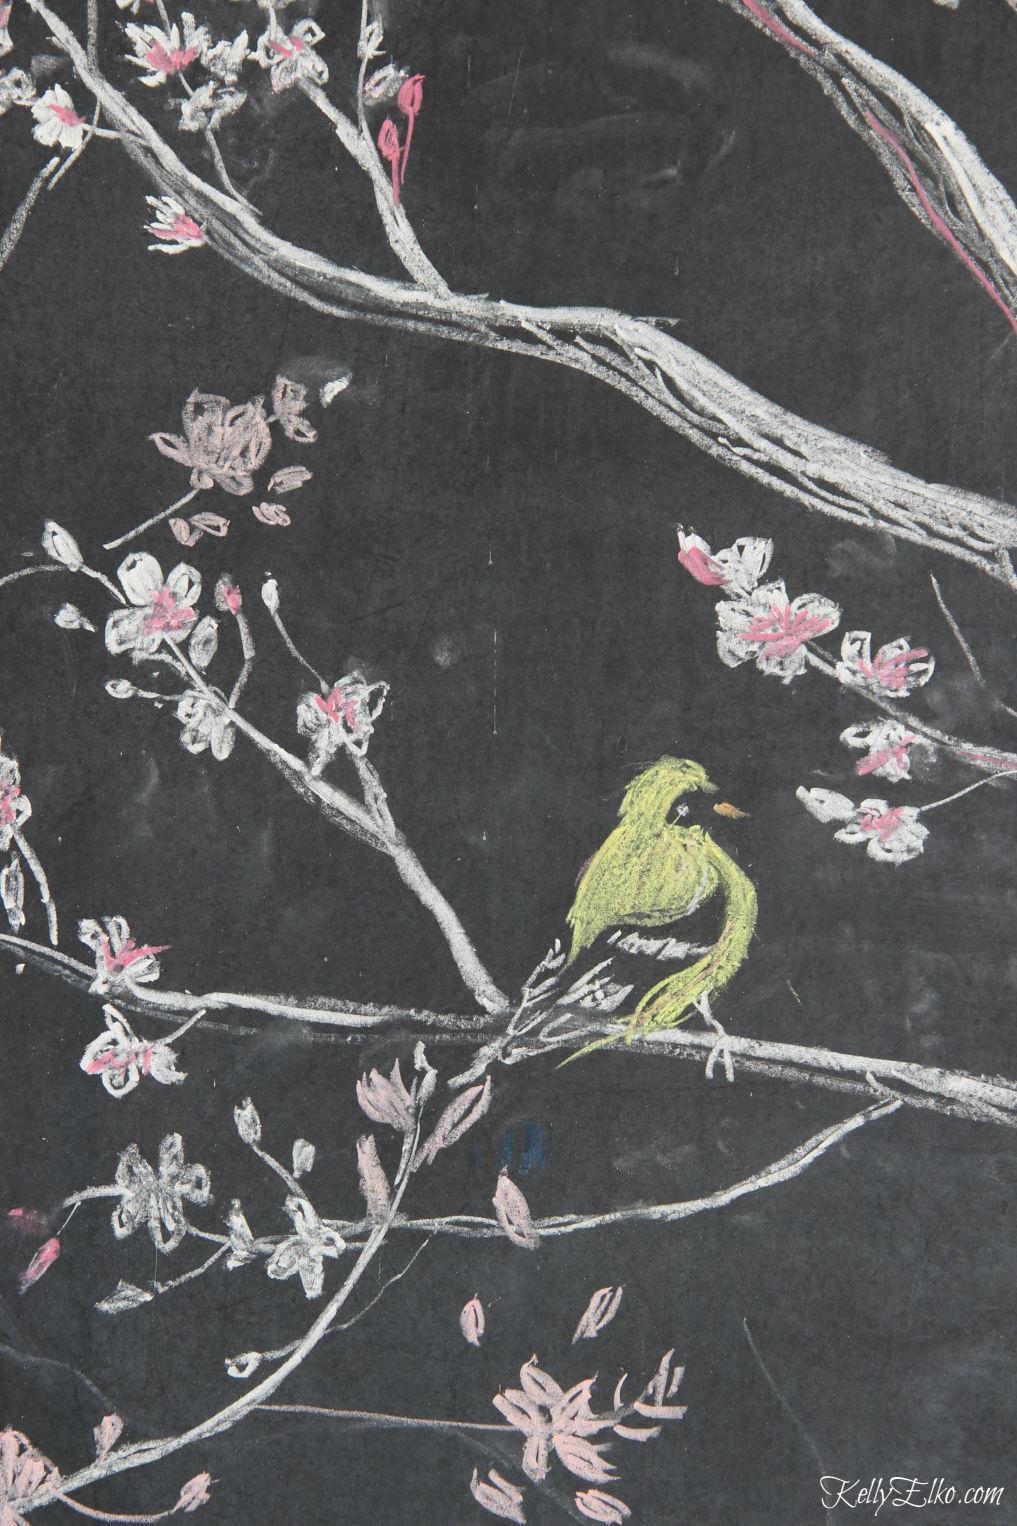 Original chalk art for spring kellyelko.com #chalkboard #chalkart #springart #springchalkboard